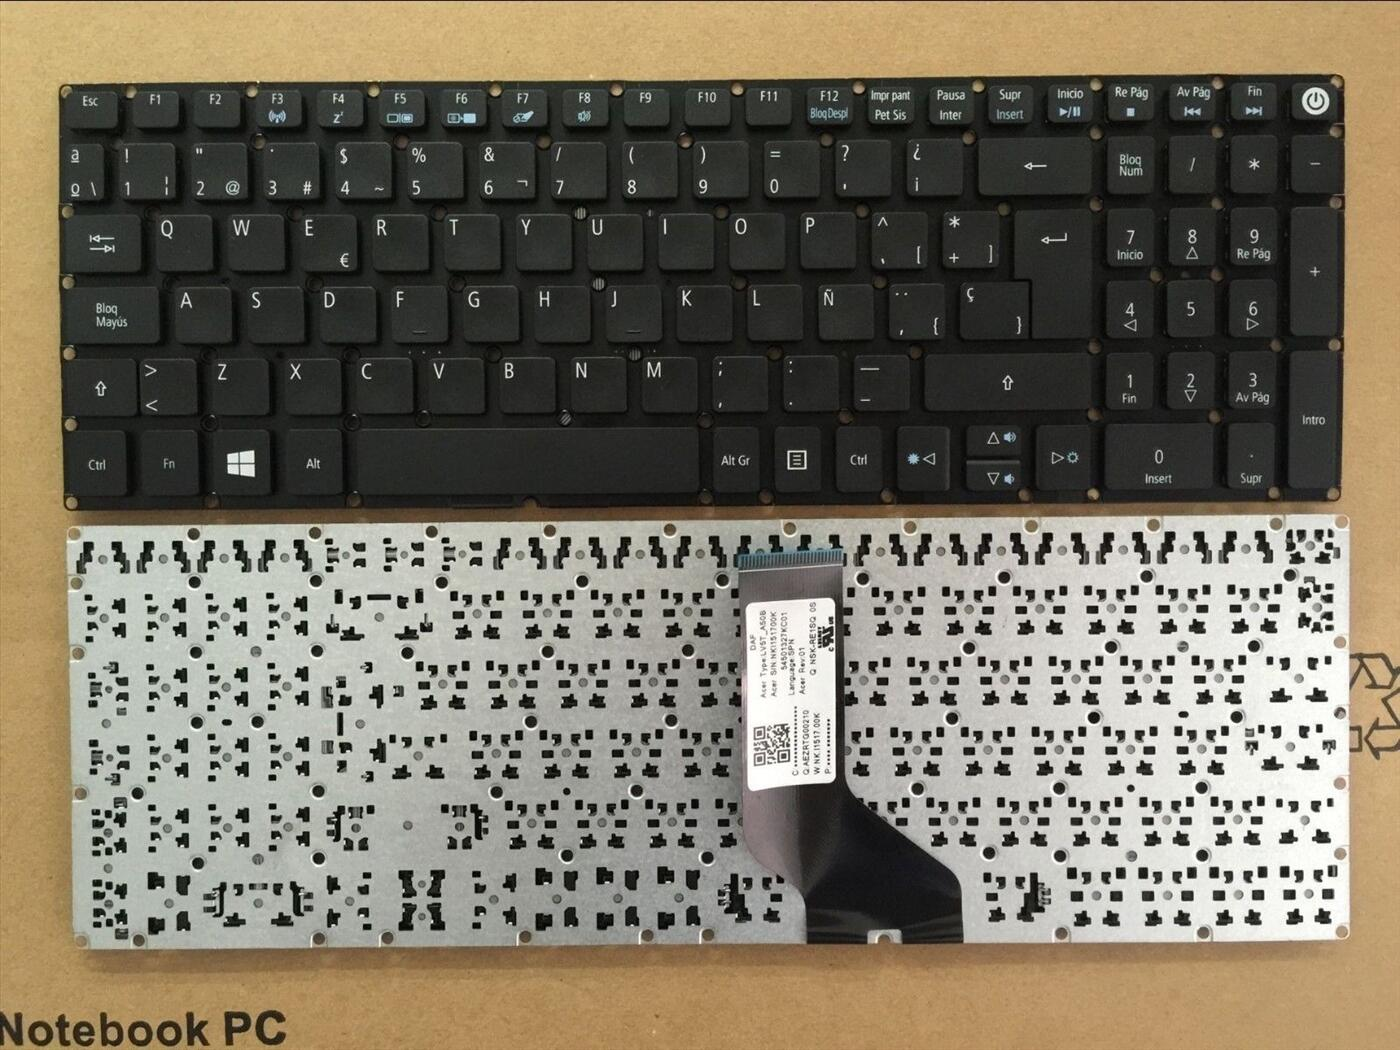 bàn phím laptop acer Aspire V 15, v15